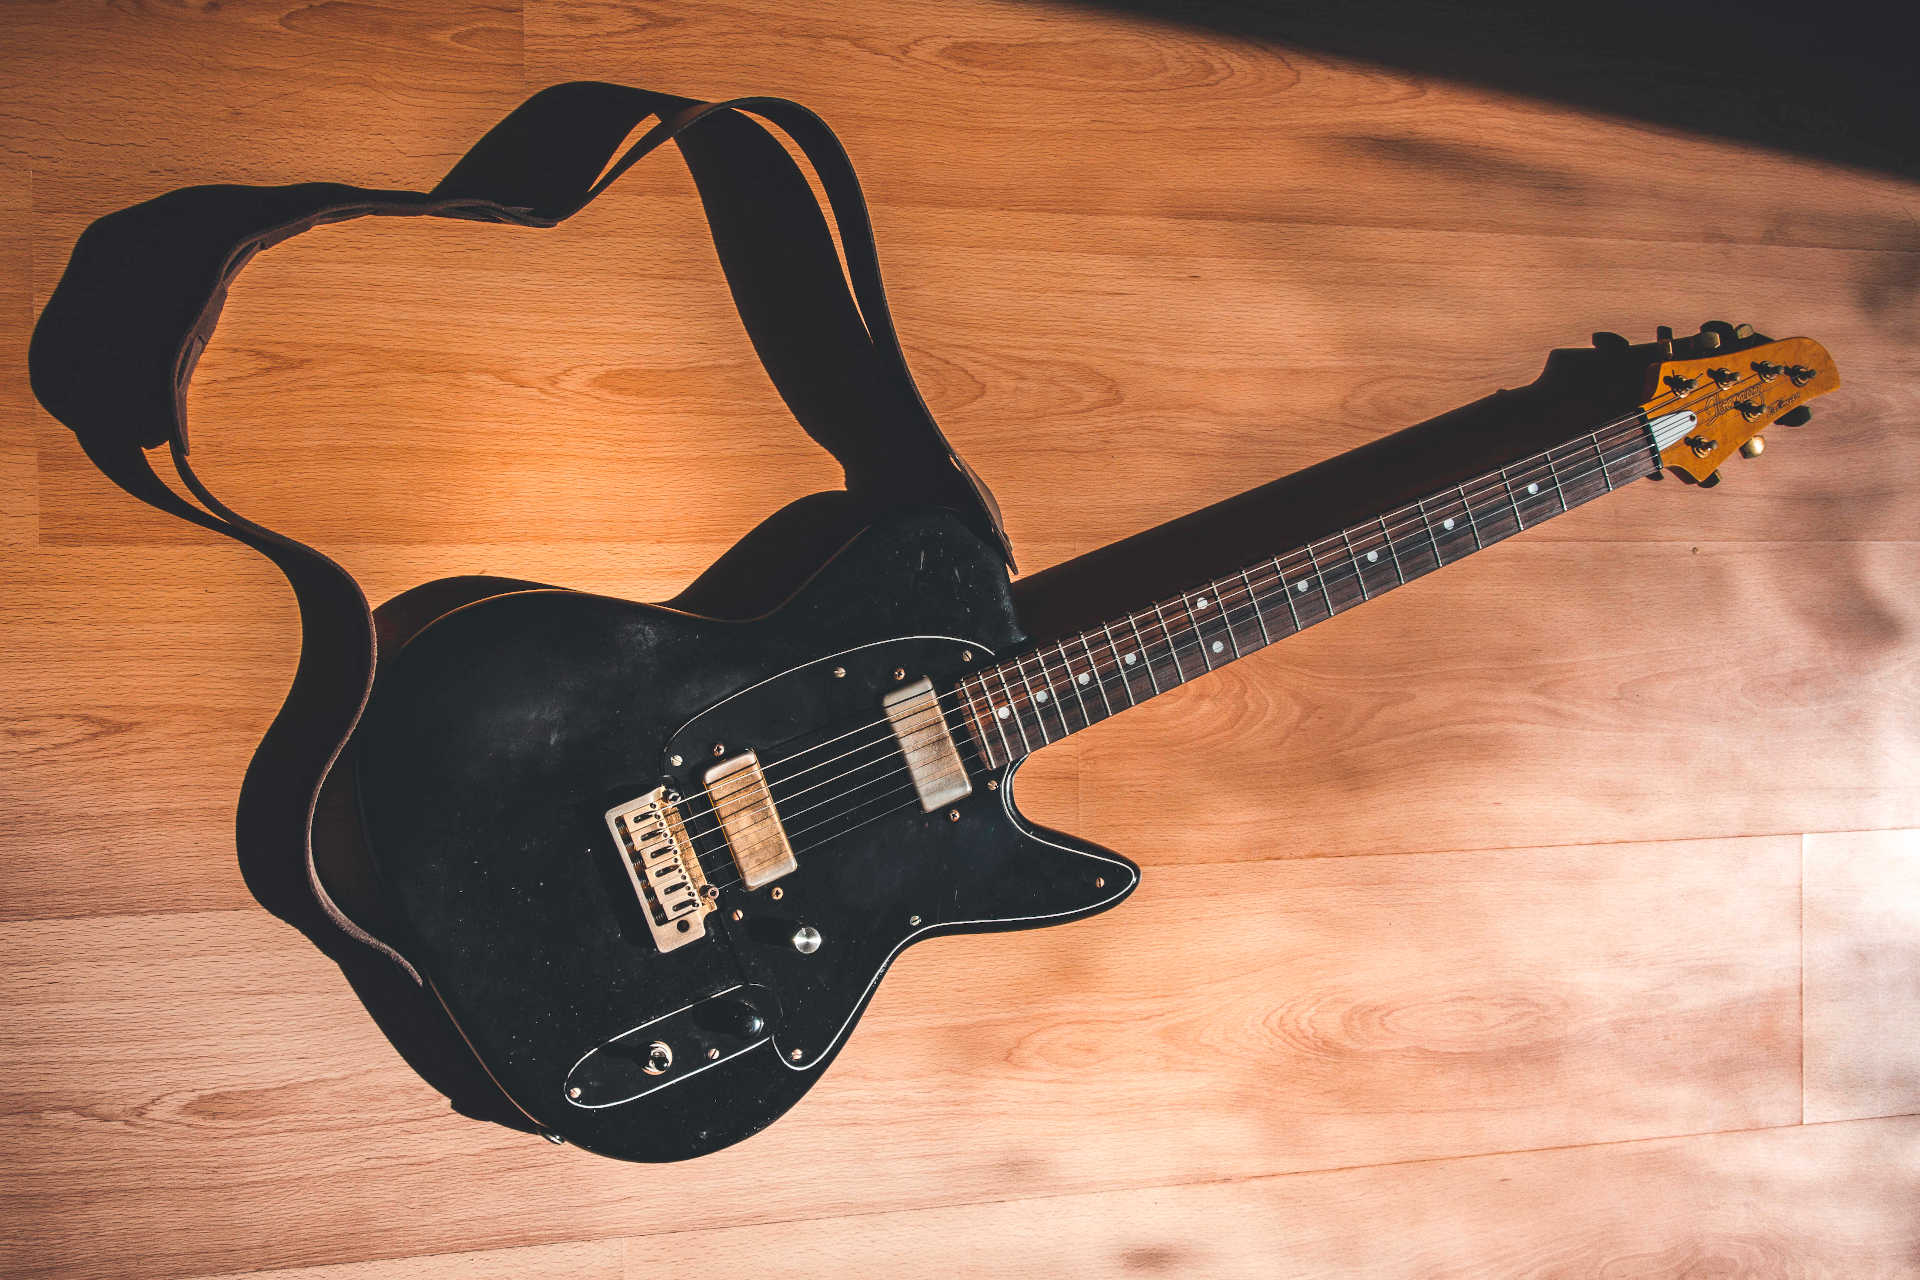 Guitare Electrique - Studio Guitare Belfort